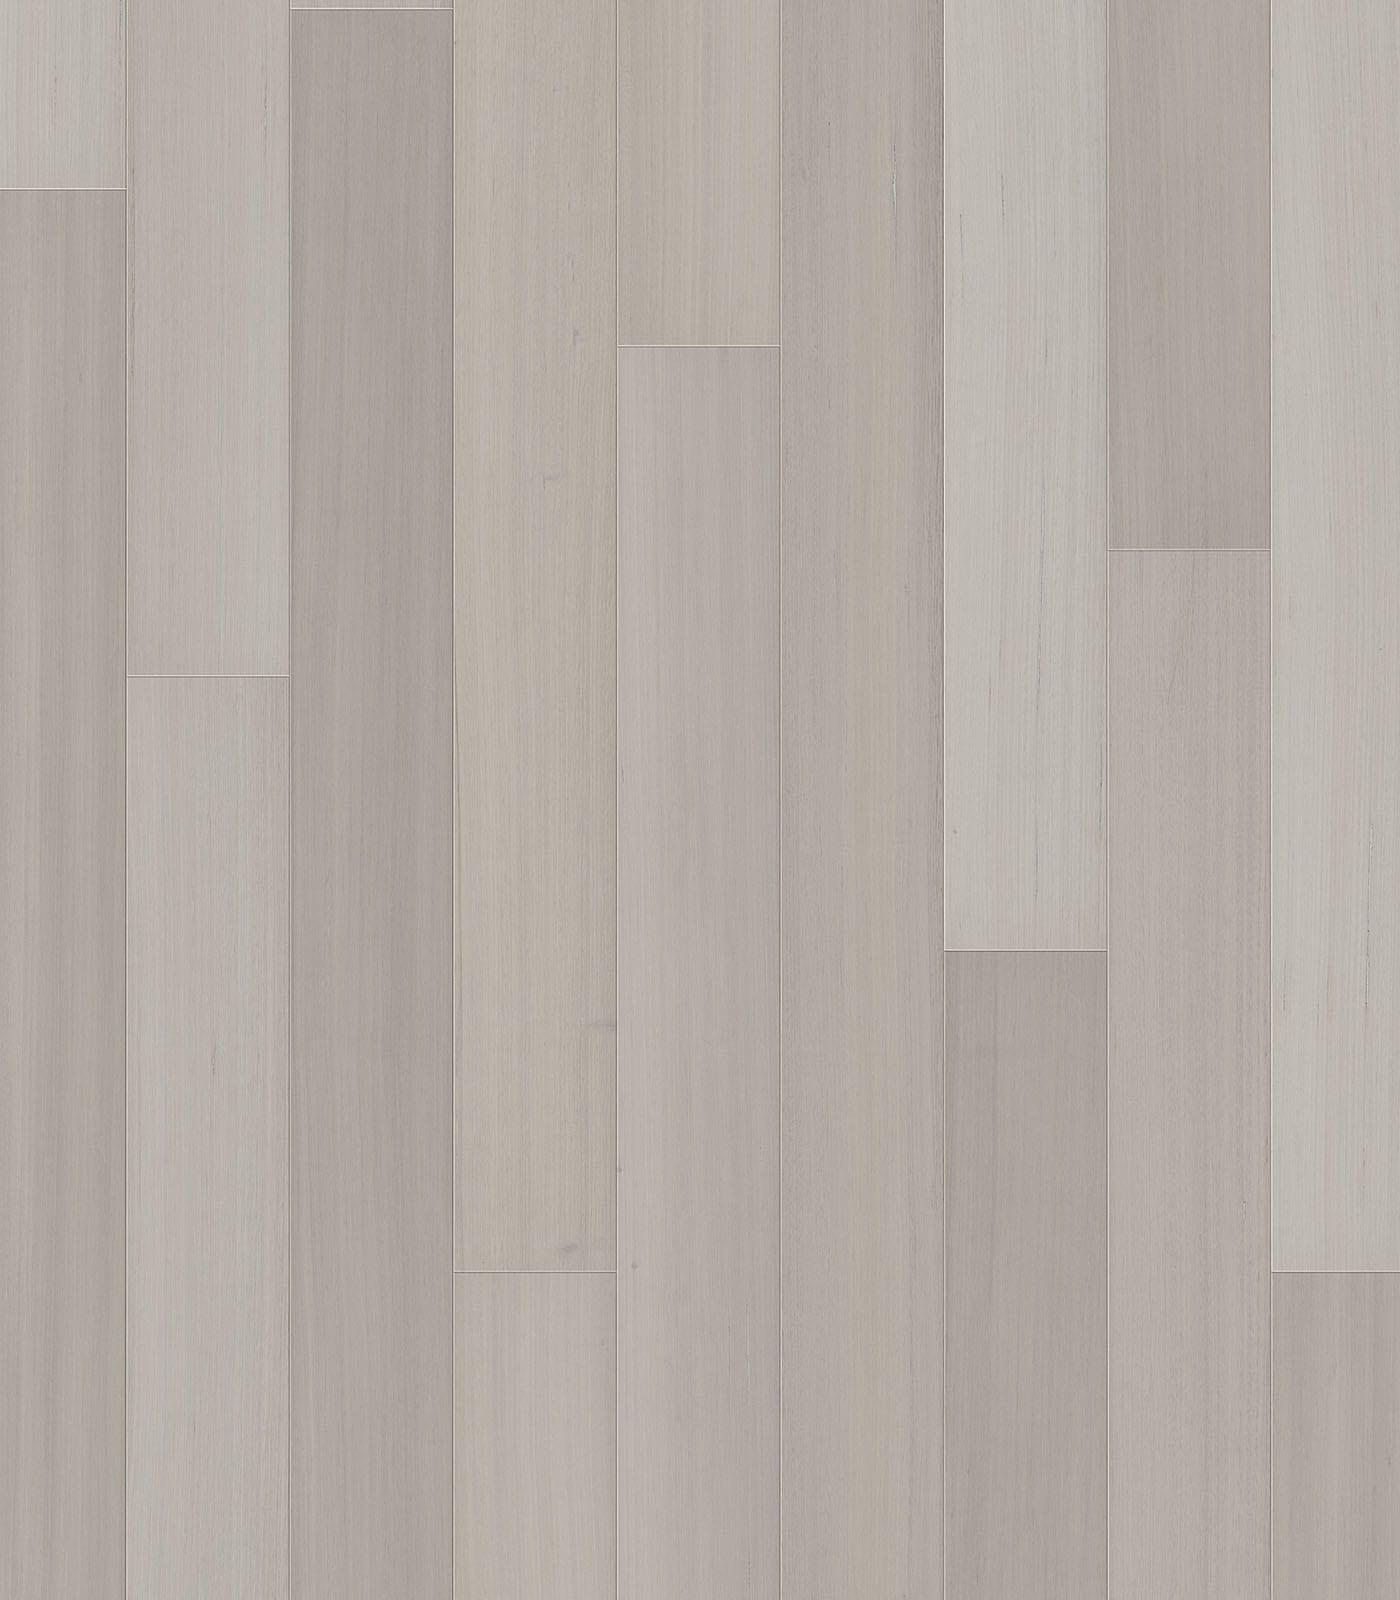 Hobart-After Oak Collection-Tasmanian Oak floors-flat